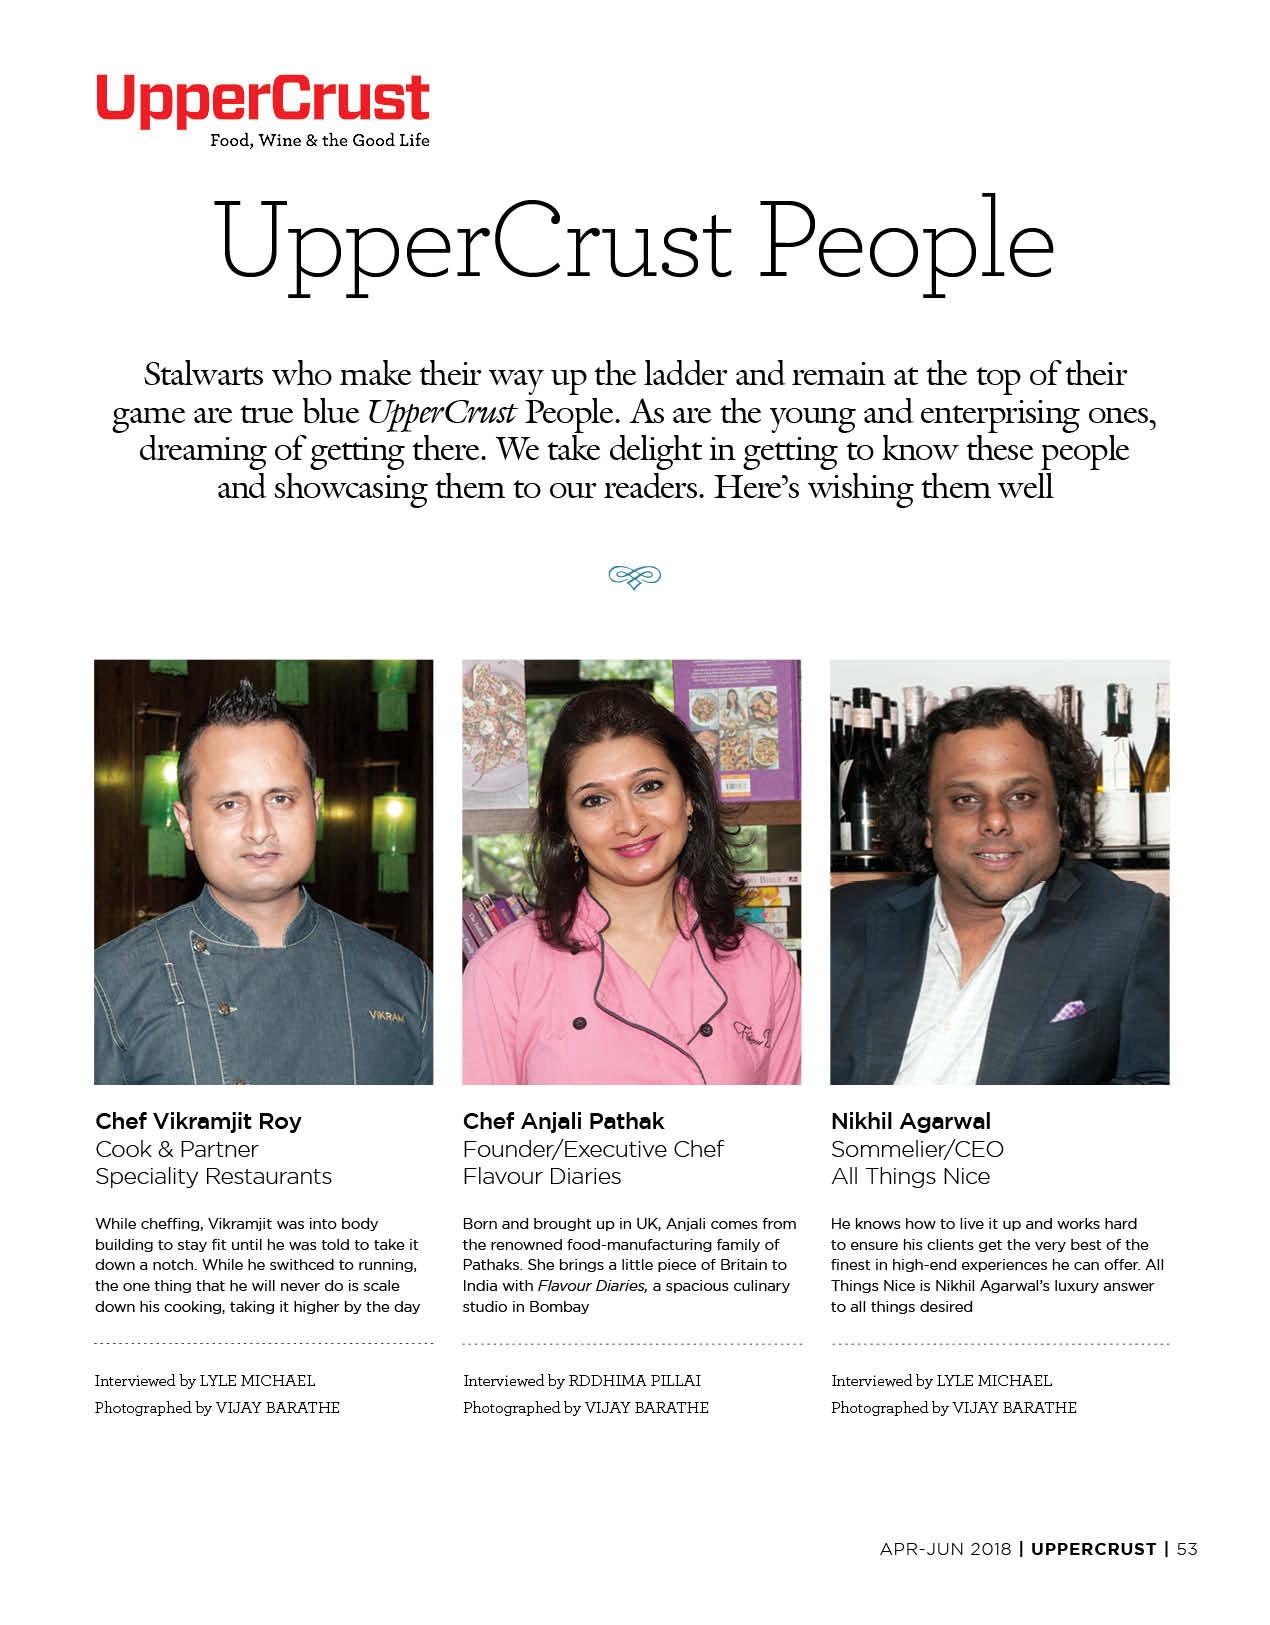 UpperCrust People1